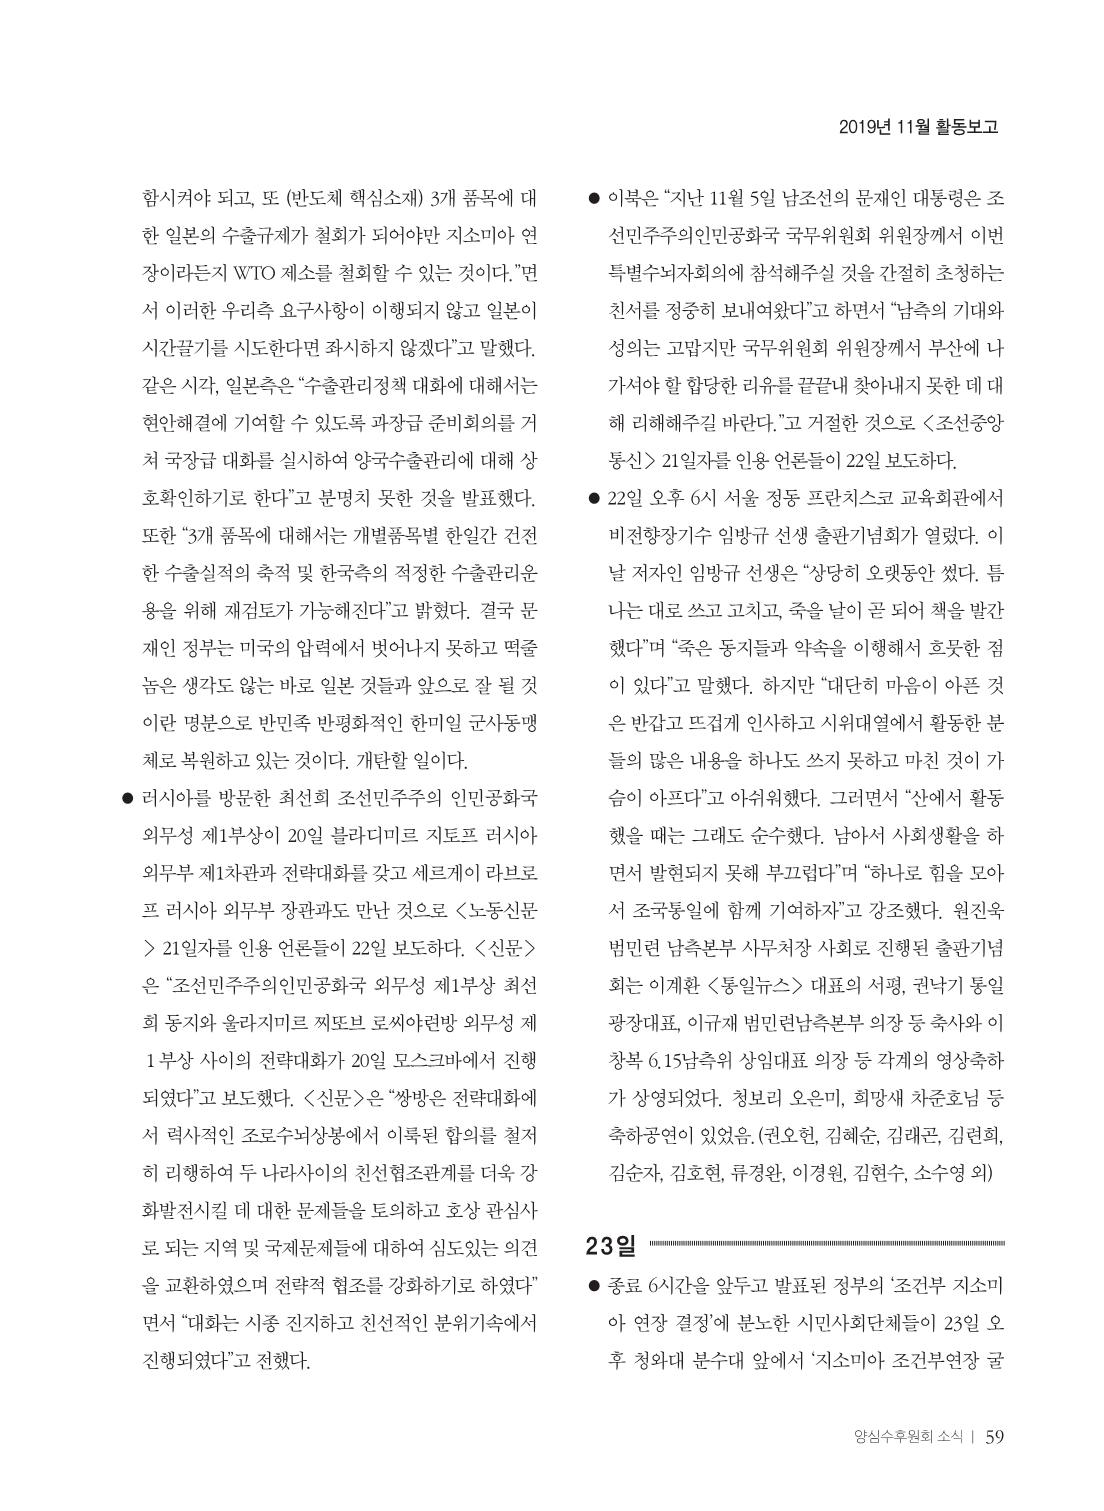 5802db1f-6a90-451c-ac2e-da2a23bee939.pdf-0061.jpg